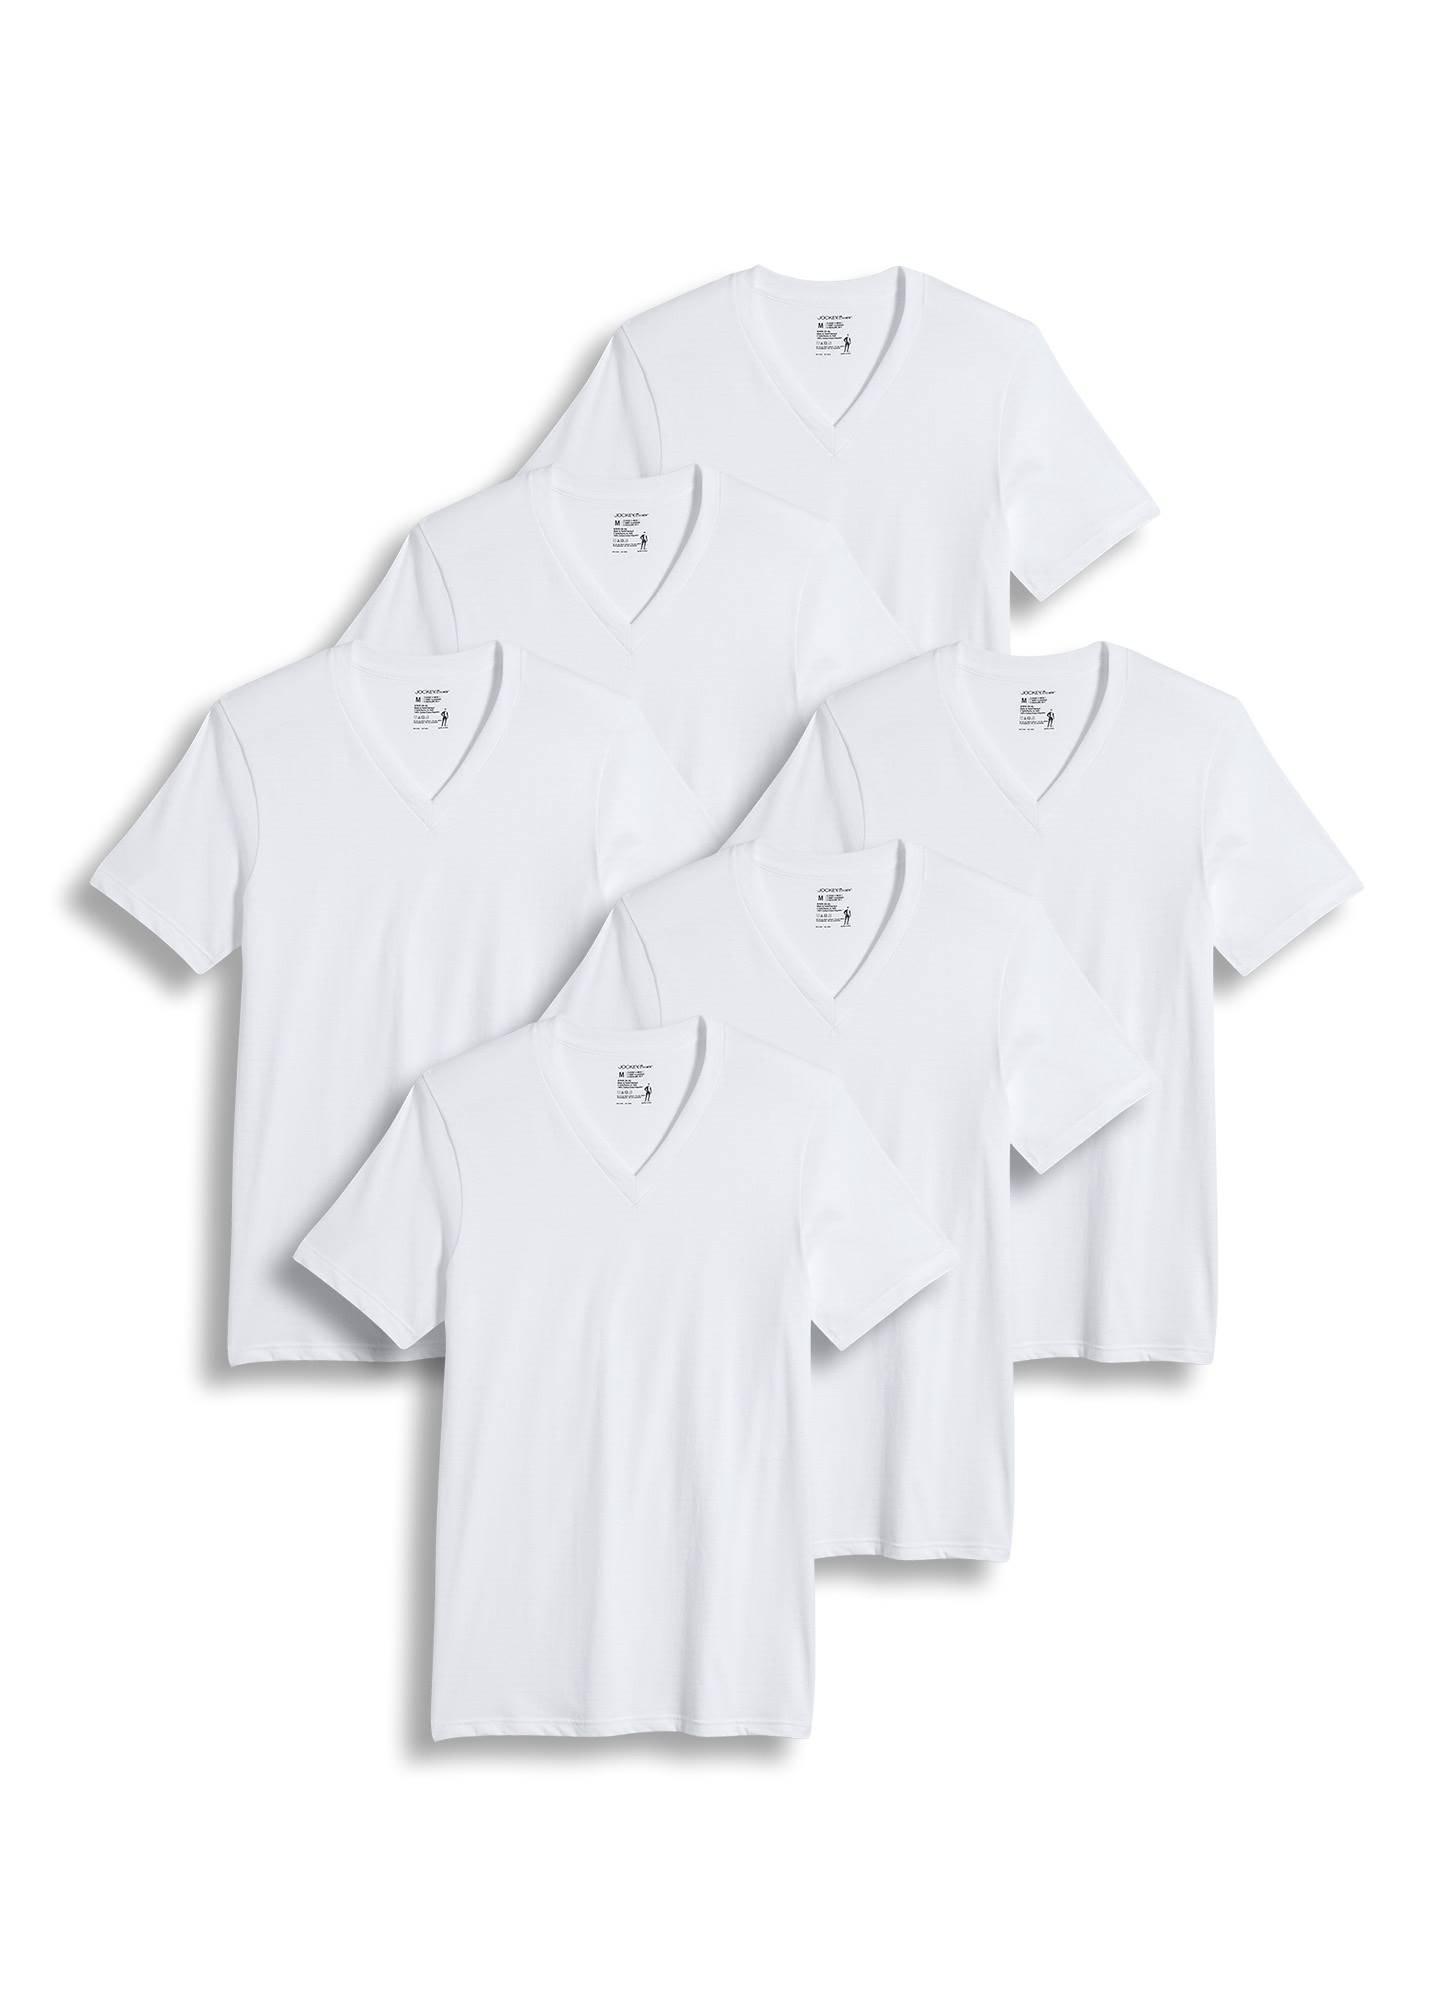 Jockey Men's T-Shirts Big & Tall Classic V-Neck T-Shirt - 6 Pack, Diamond White, XLT